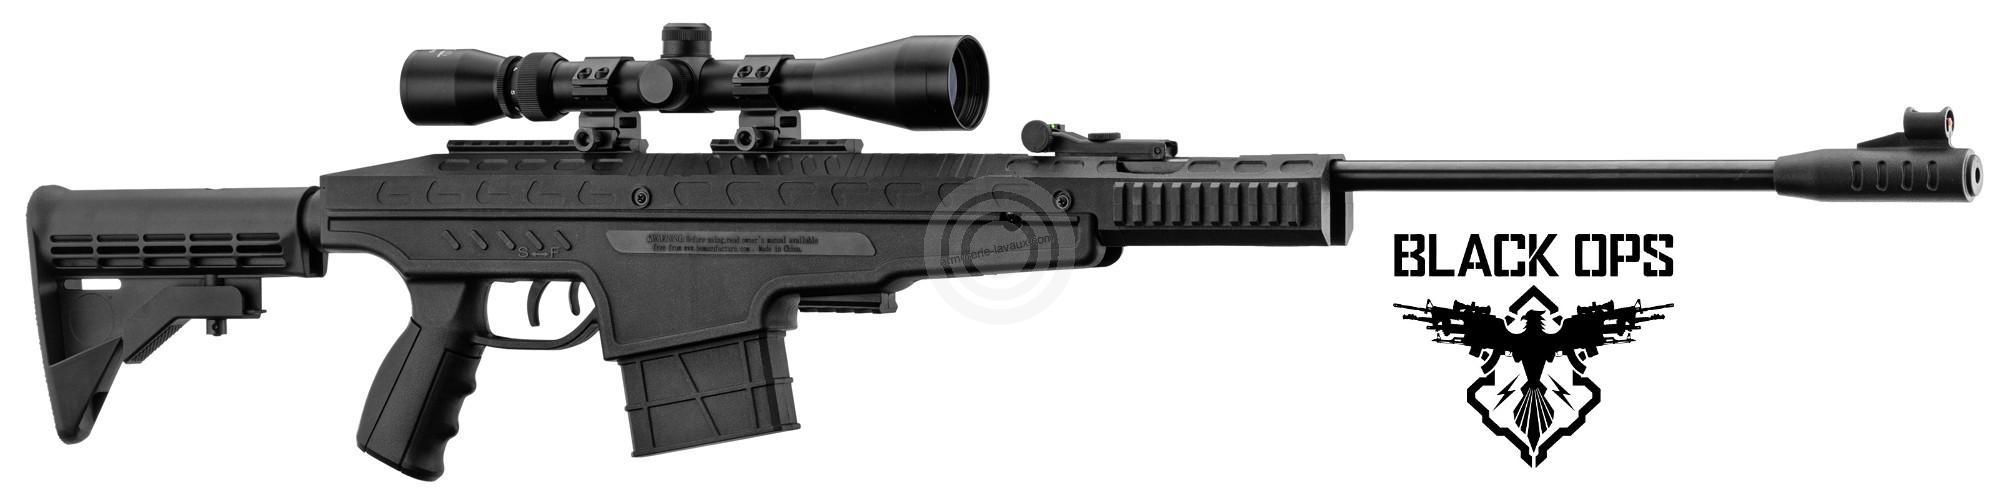 Carabine à plombs Tactical BLACK OPS PENDLETON BLACK ''Combo lunette 3-9x40'' (19,9 joules) cal.4,5mm